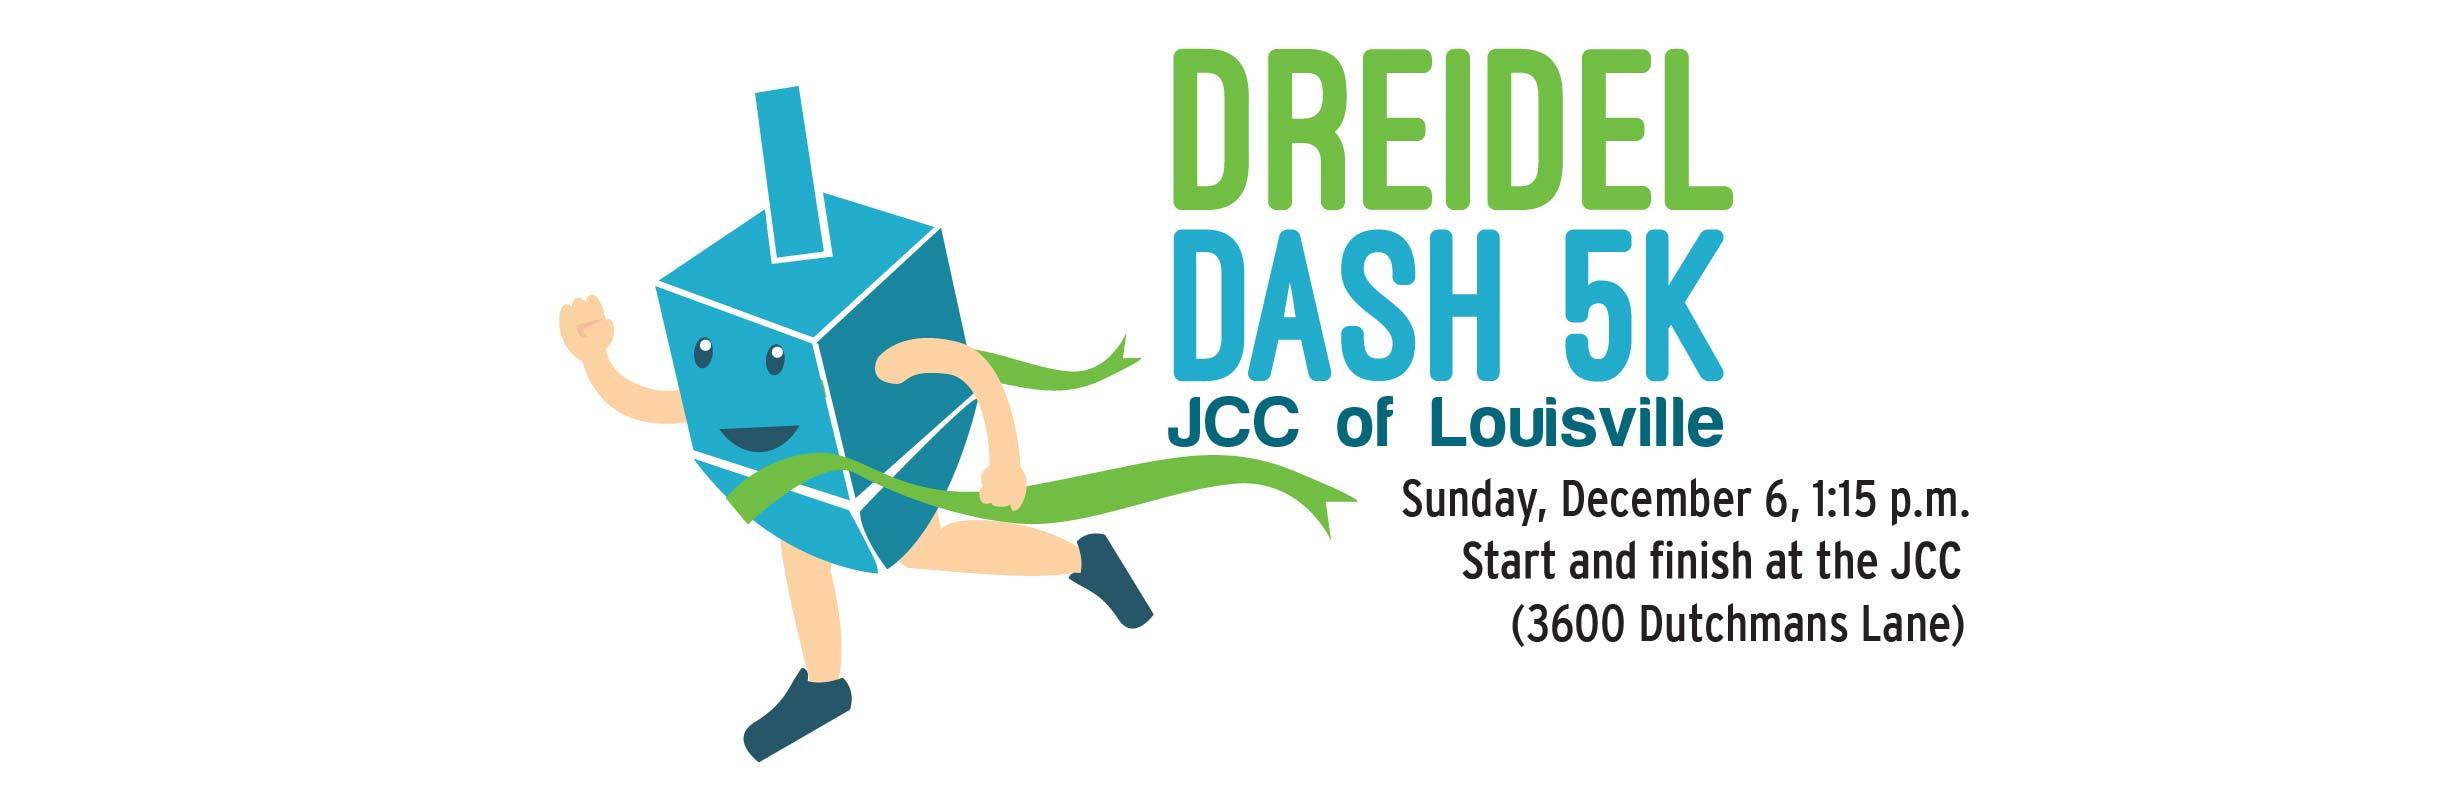 Dreidel Dash to Challenge Runners in December